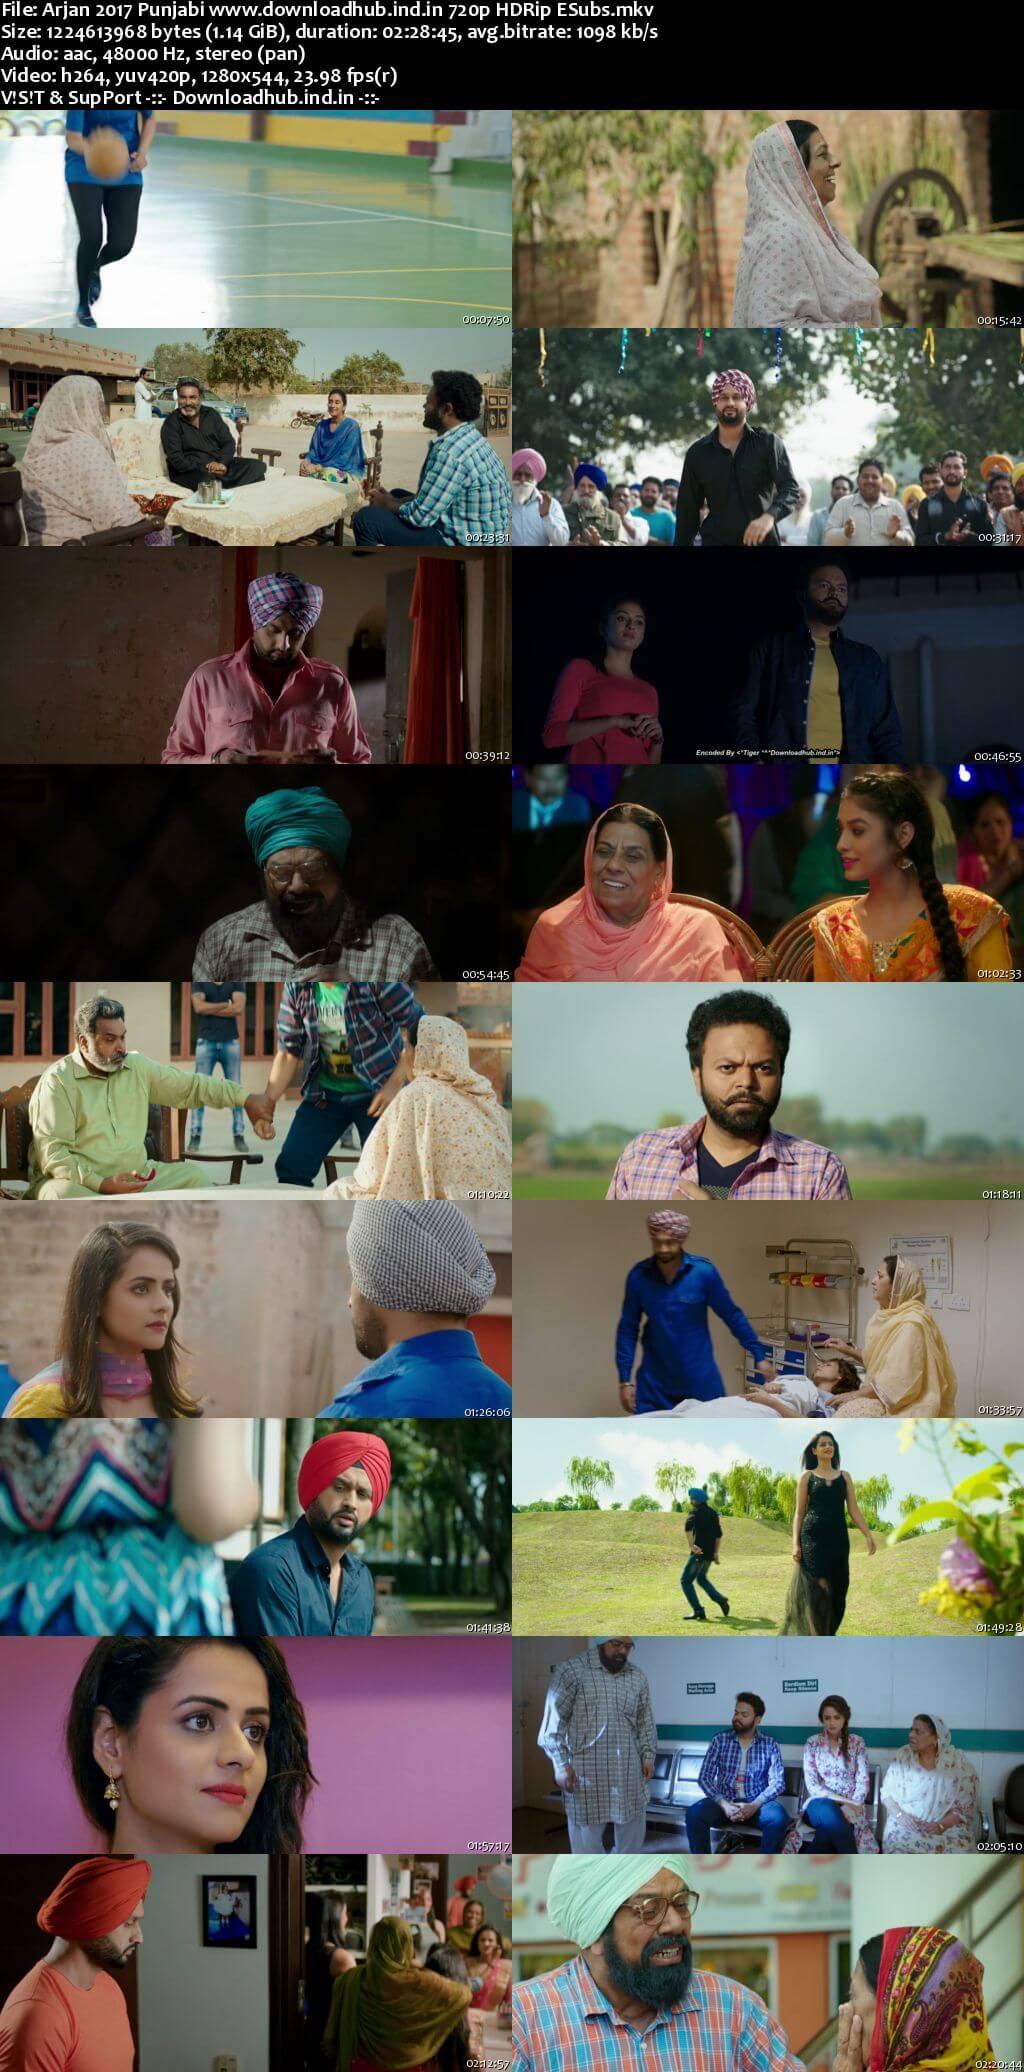 Arjan 2017 Punjabi 720p HDRip ESubs